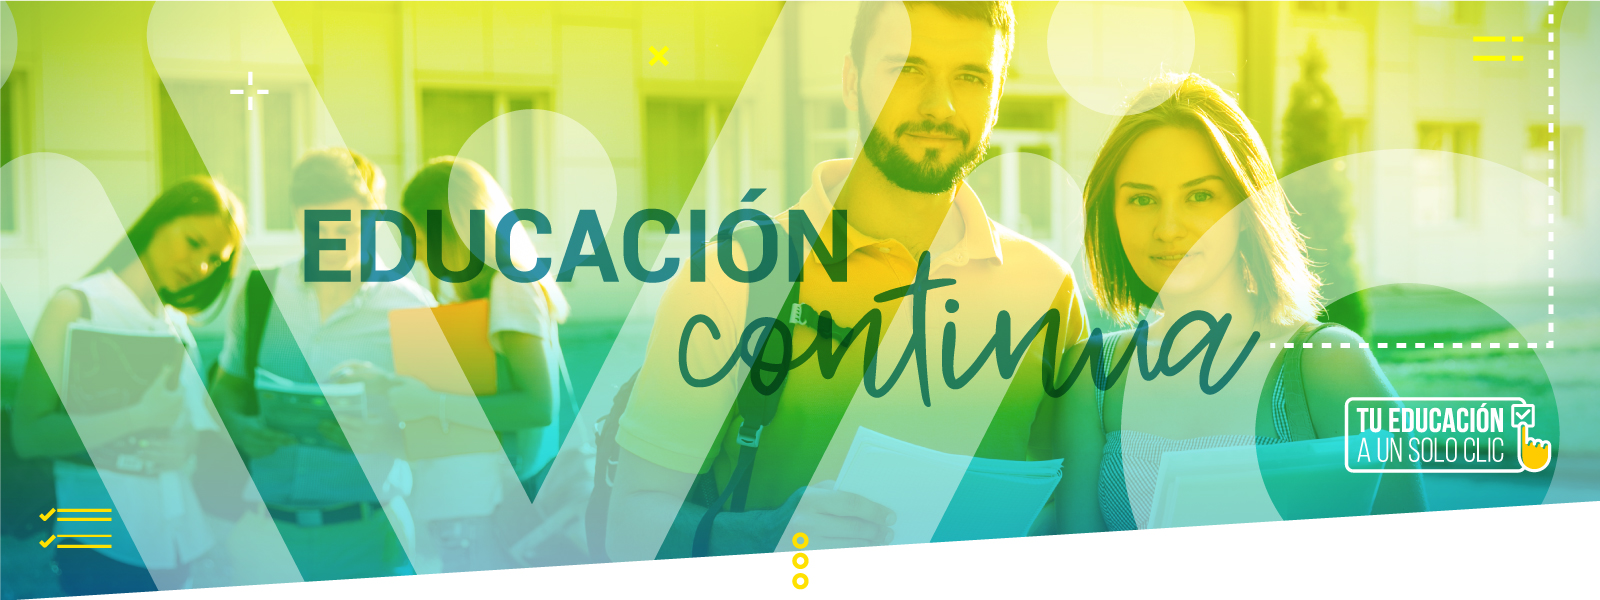 Banner-Educacion-continua-2021